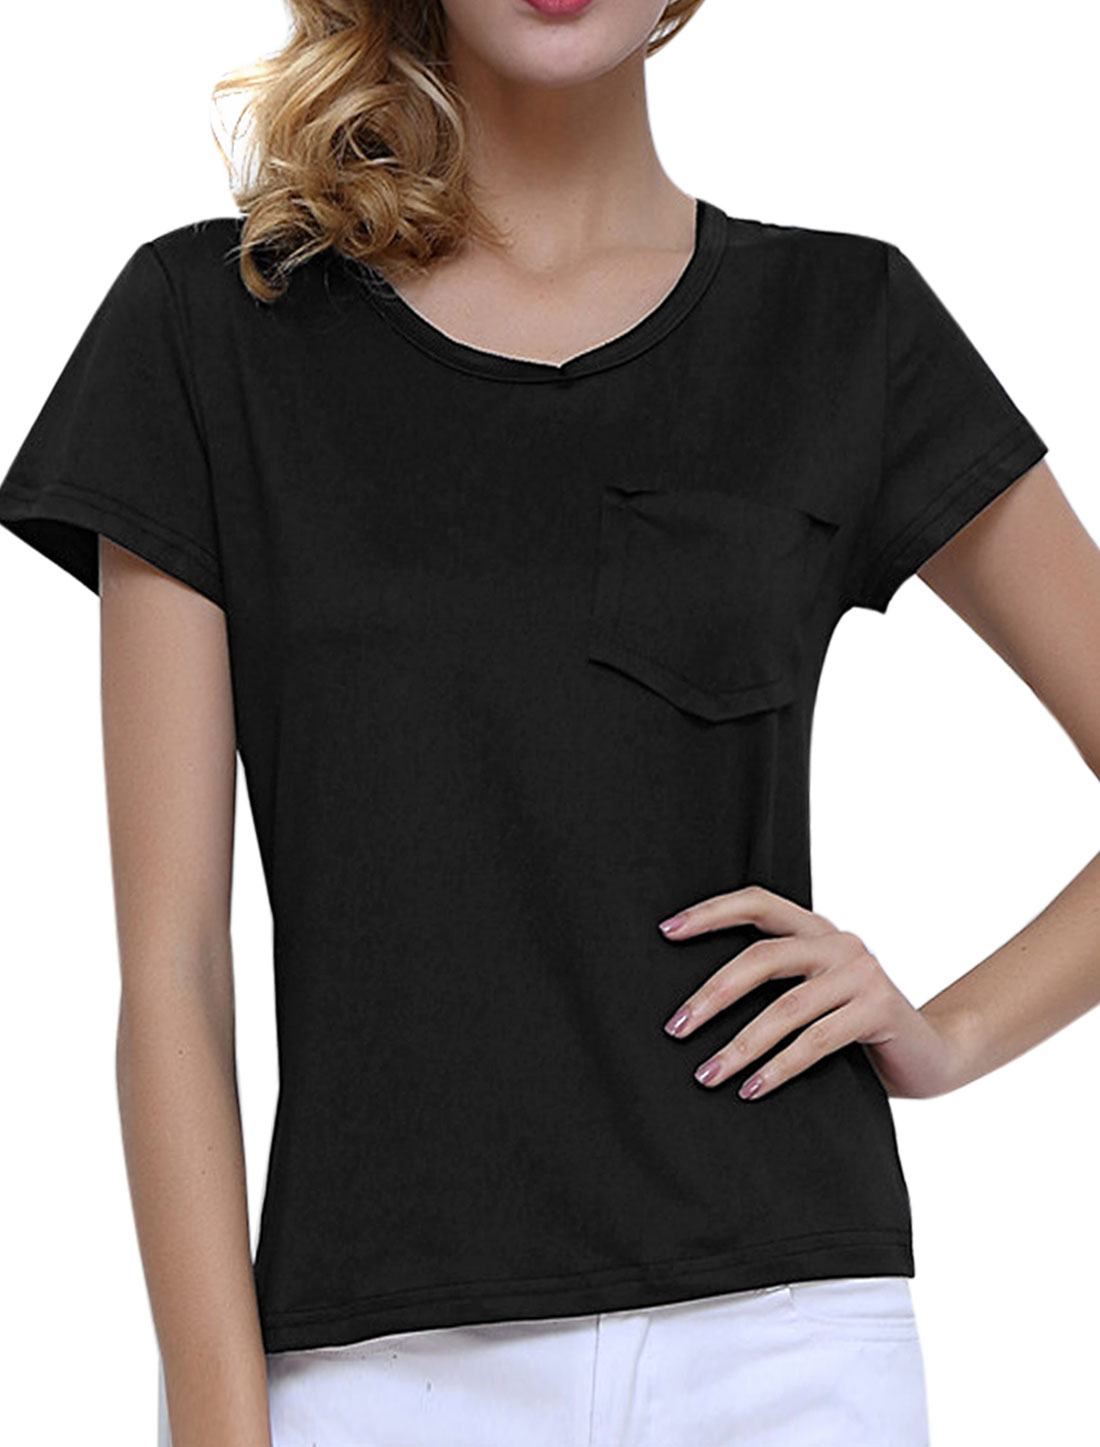 Women V Neck Short Sleeves Single Pocket Tee Shirt Black M